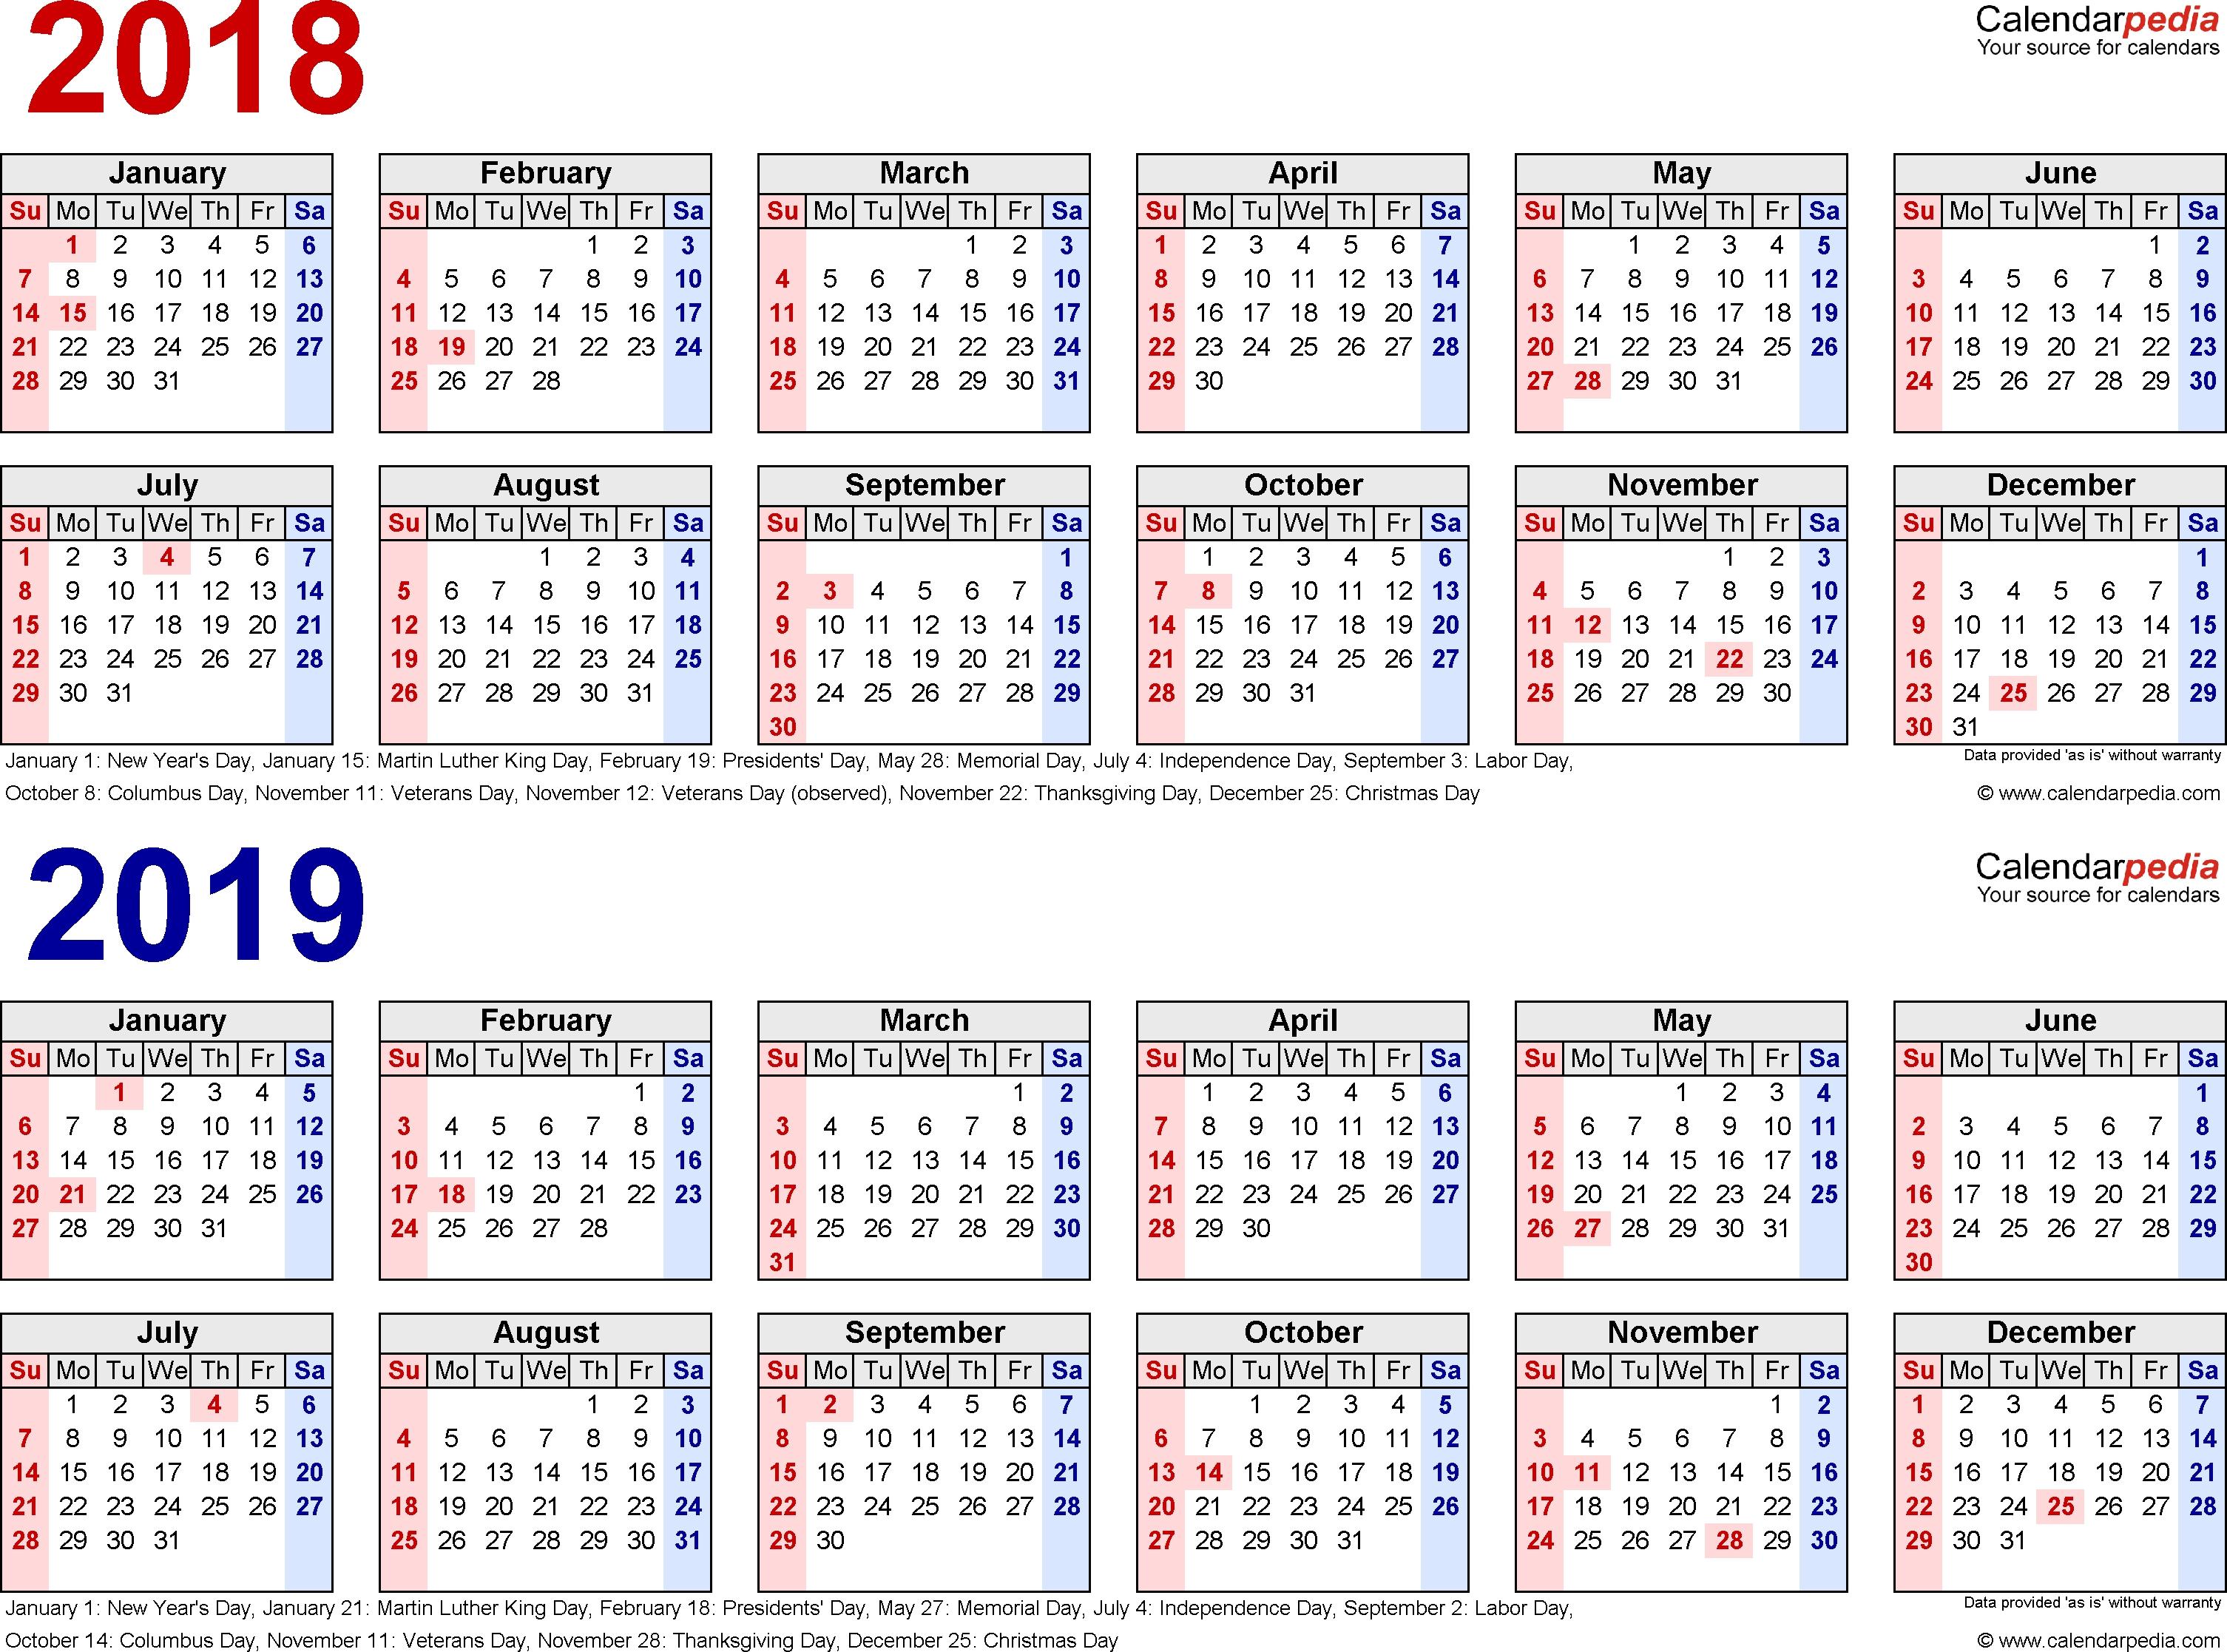 Image Result For Free Printable 2018 /2019 Calendar   Printable W H Smith Calendar 2019